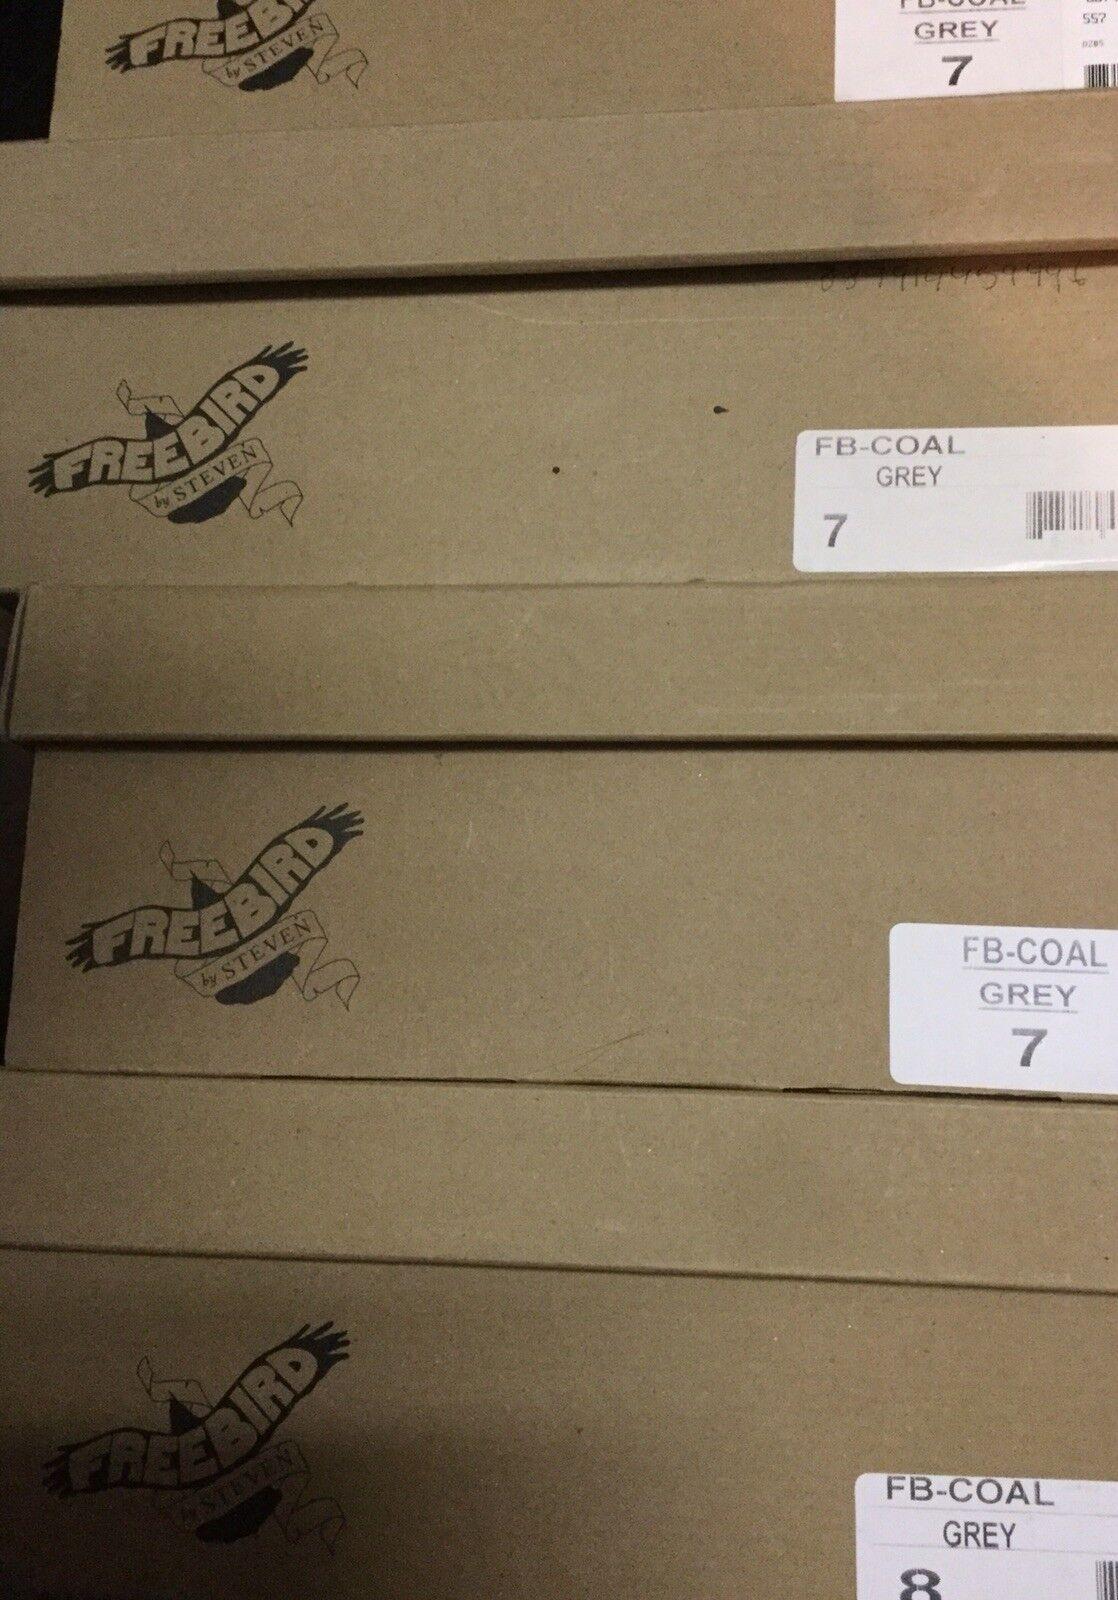 FREEBIRD BY STEVEN COAL Grey TALL CORSET BOOT BOOT BOOT NIB size 6  RARE 93b1aa